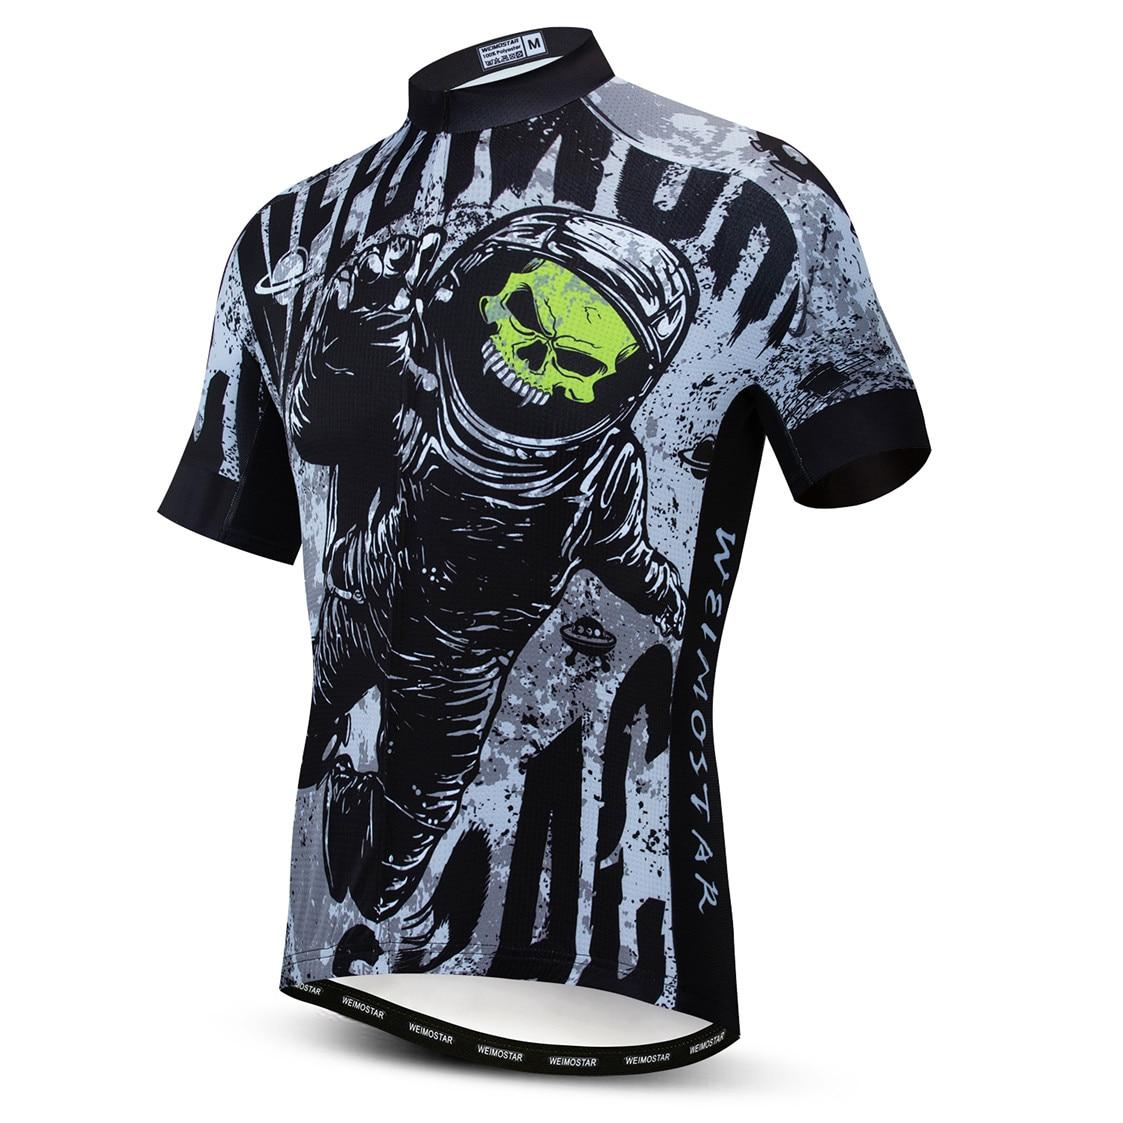 2020 Cycling Jersey men Bike mountain road MTB bicycle shirt Ropa Ciclismo maillot Racing cycle top summer clothing skull green